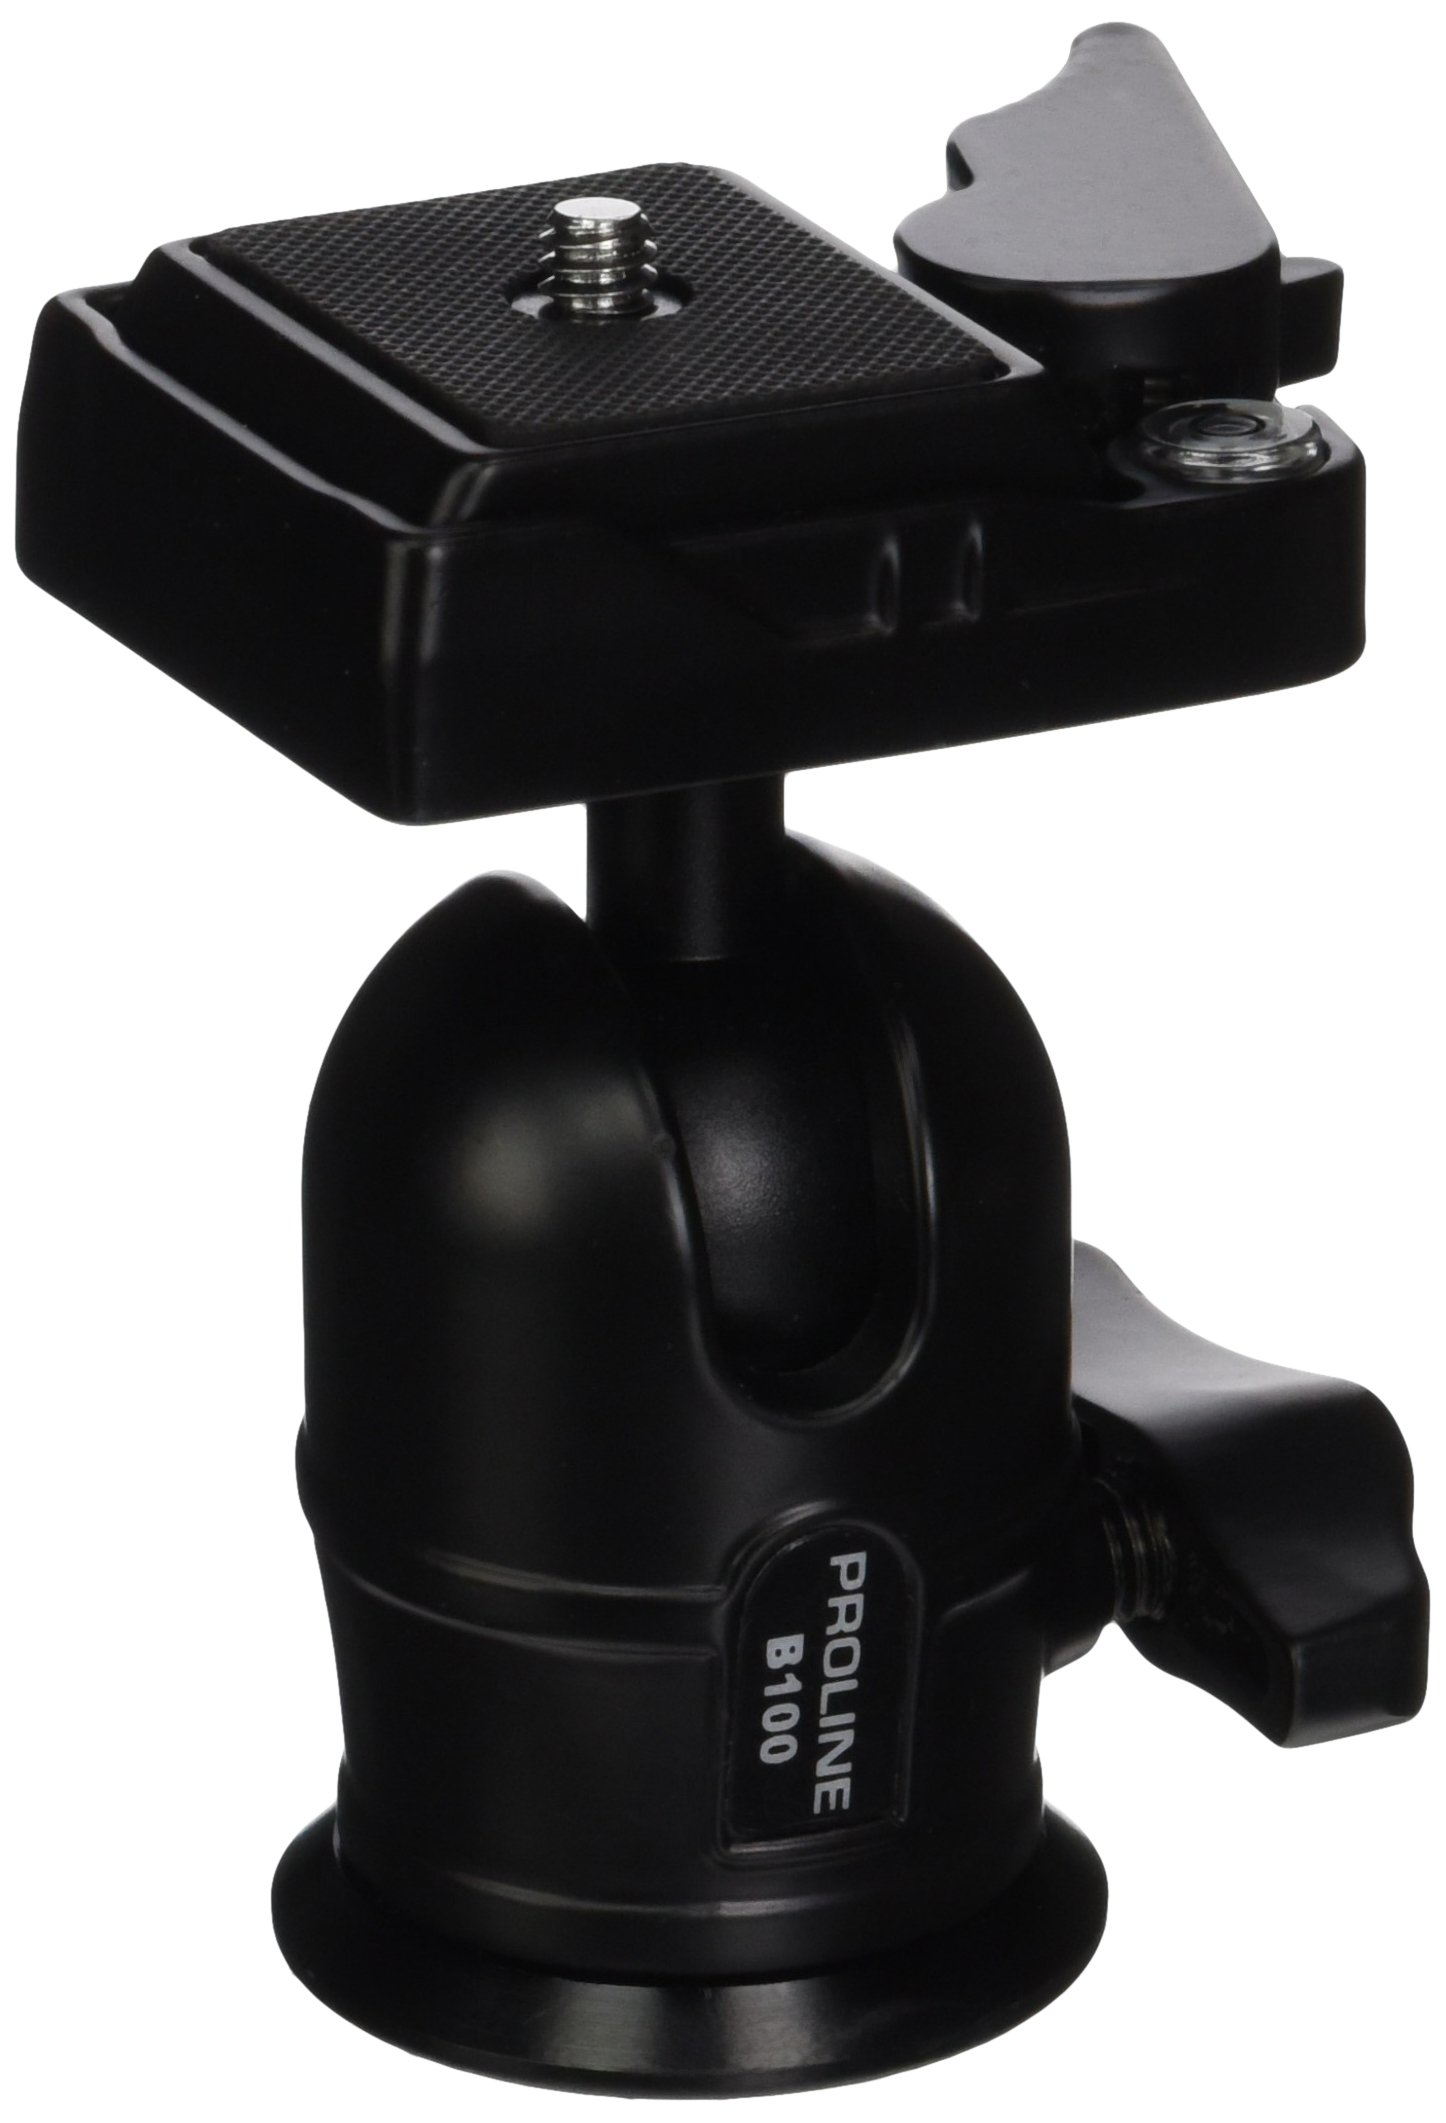 Dolica B100 Lightweight, Medium, Tripod Ball head, Black, compact